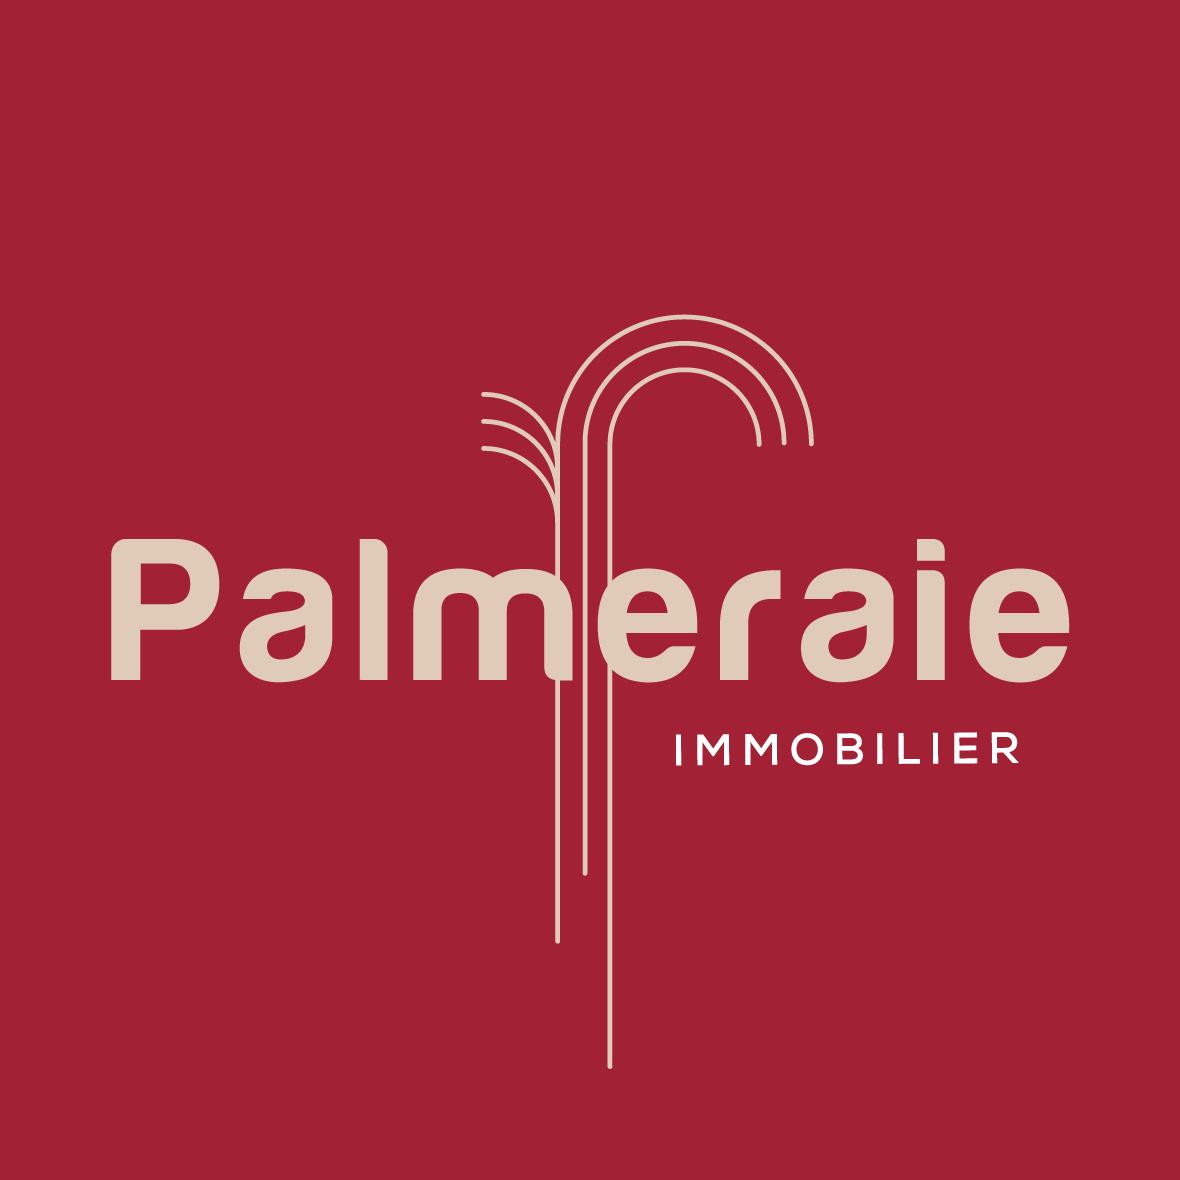 Palmeraie immobilier